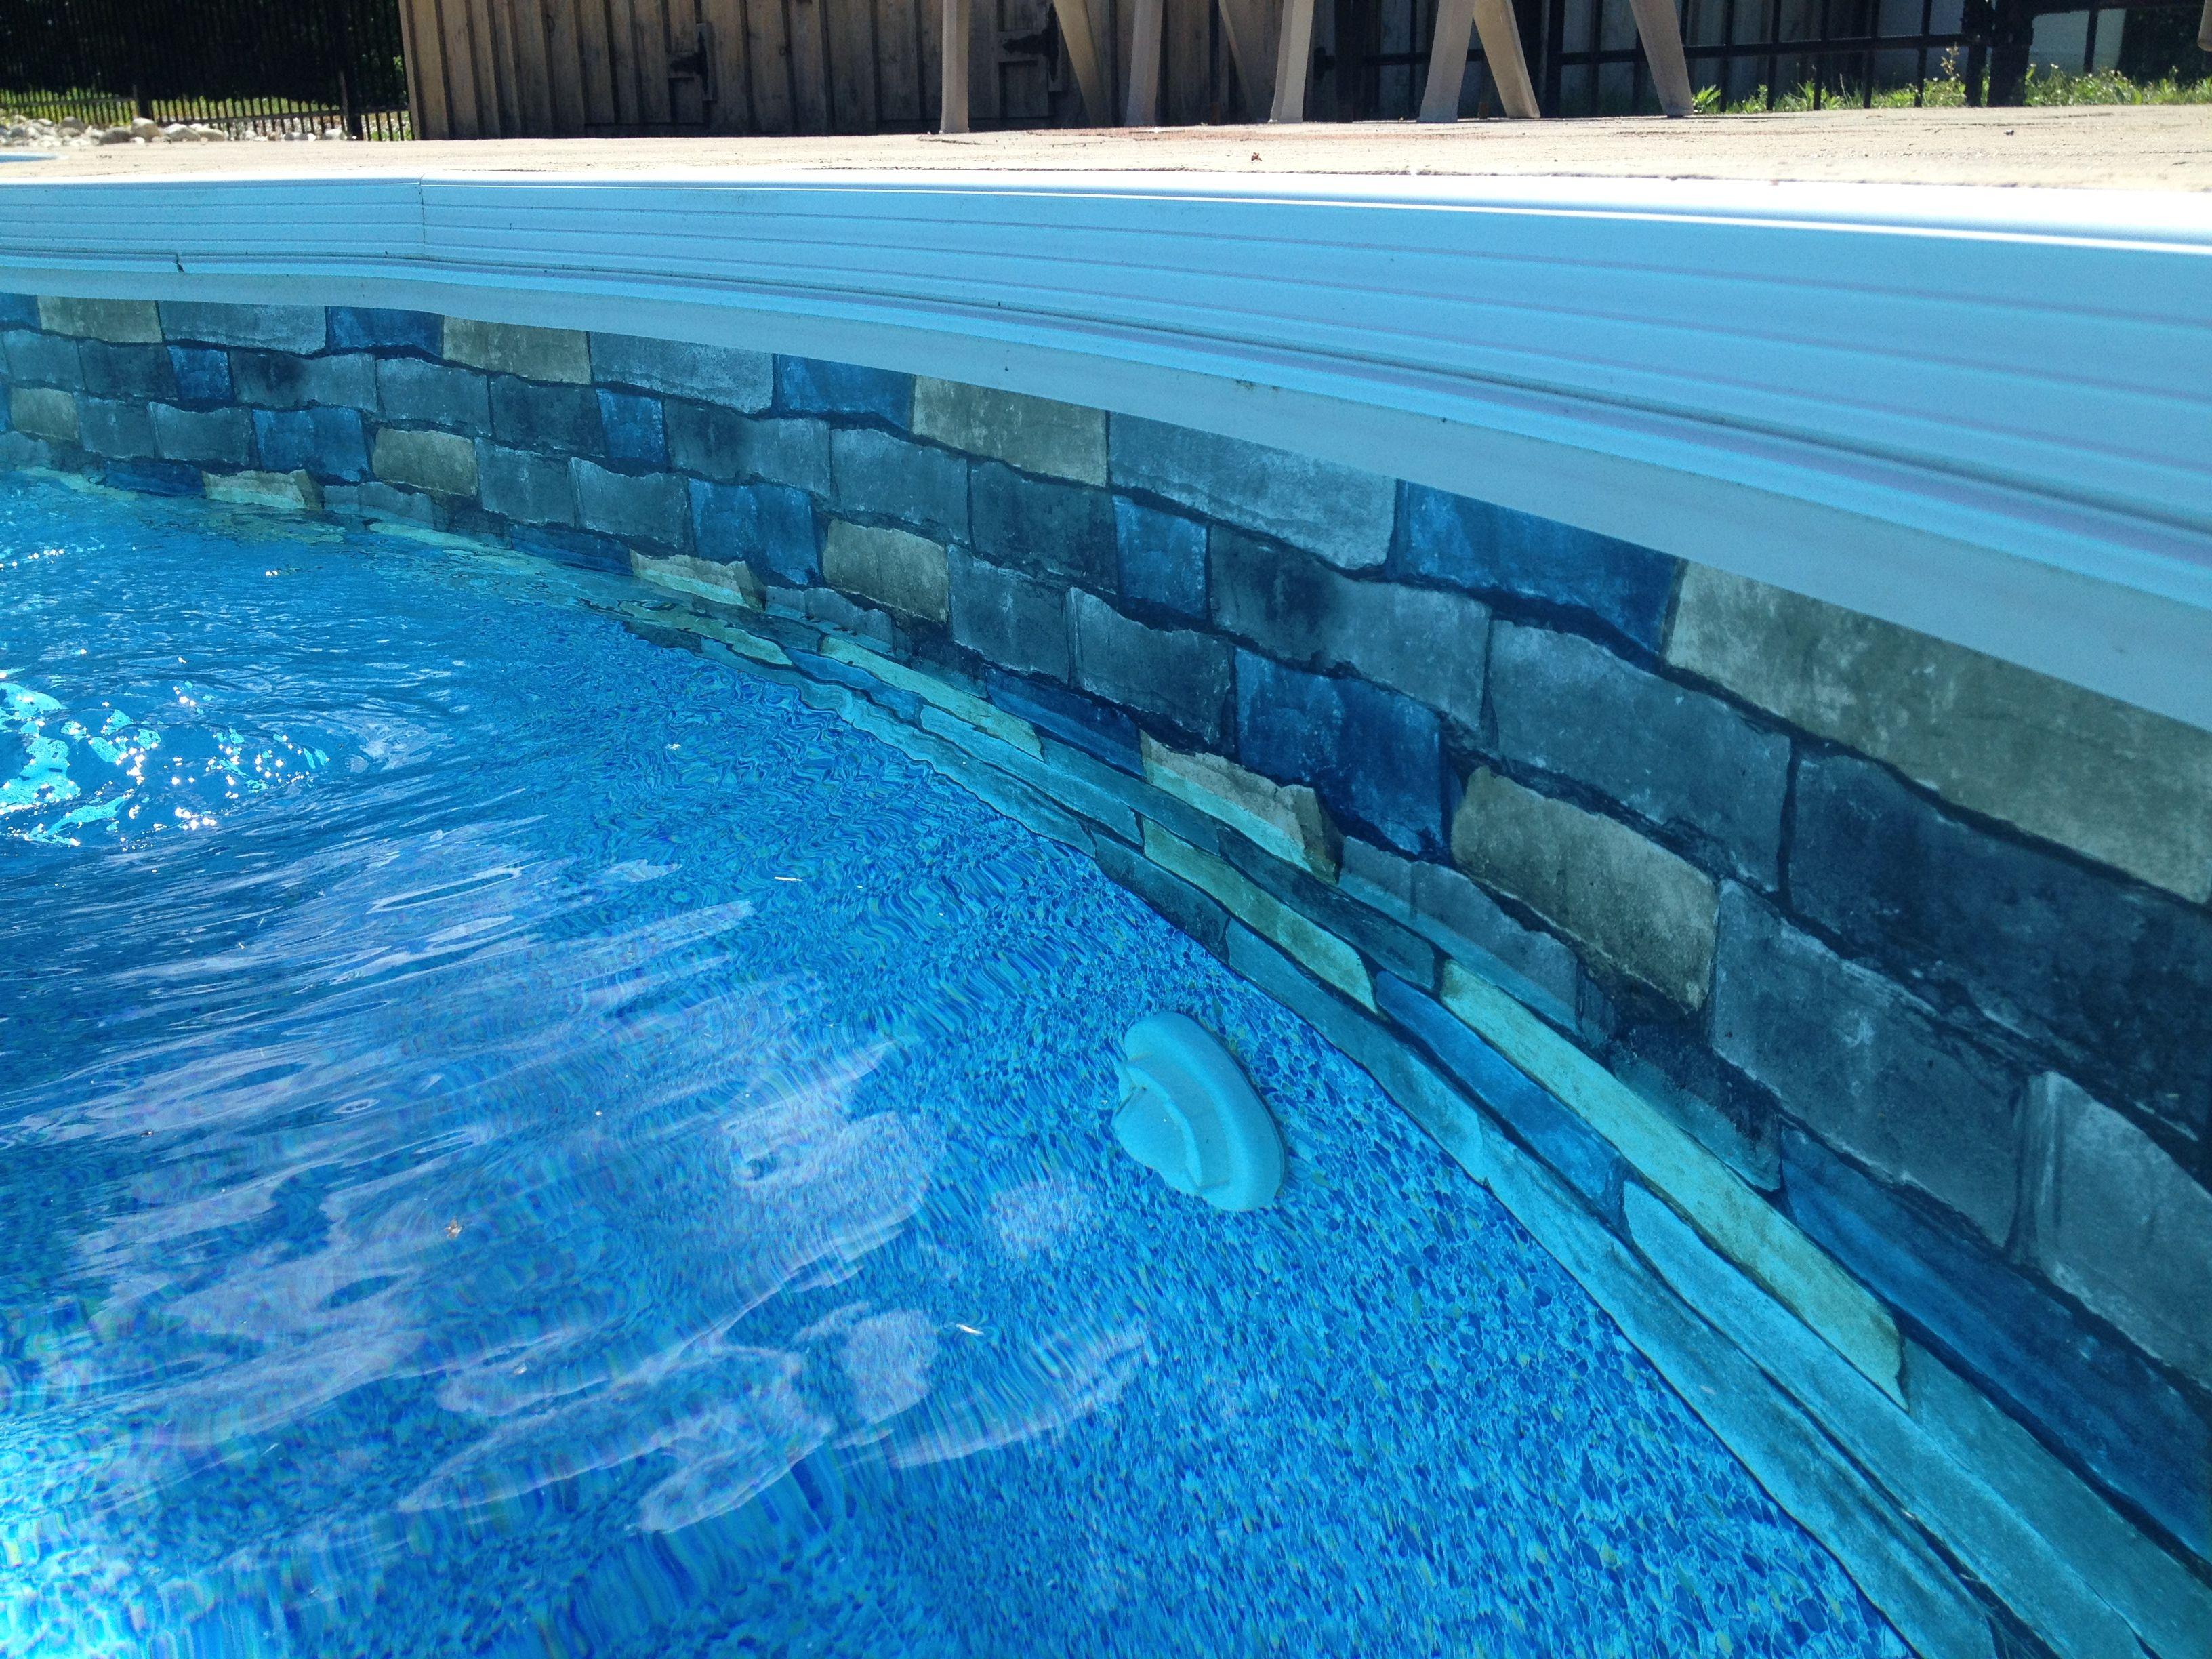 Brick pool liner pool liners above ground pool liners